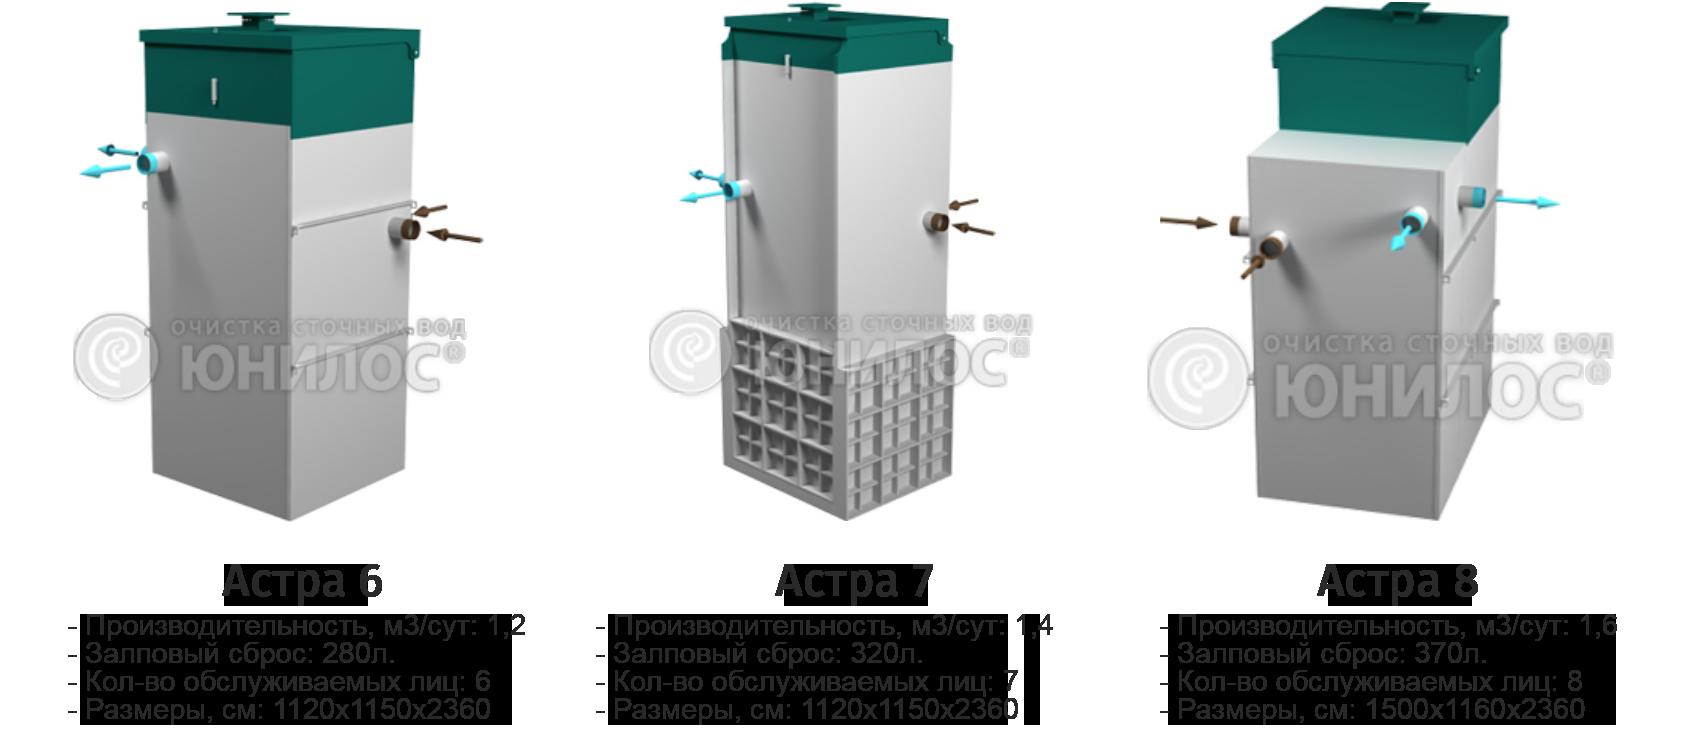 Септик юнилос астра 6: описание и технические характеристики